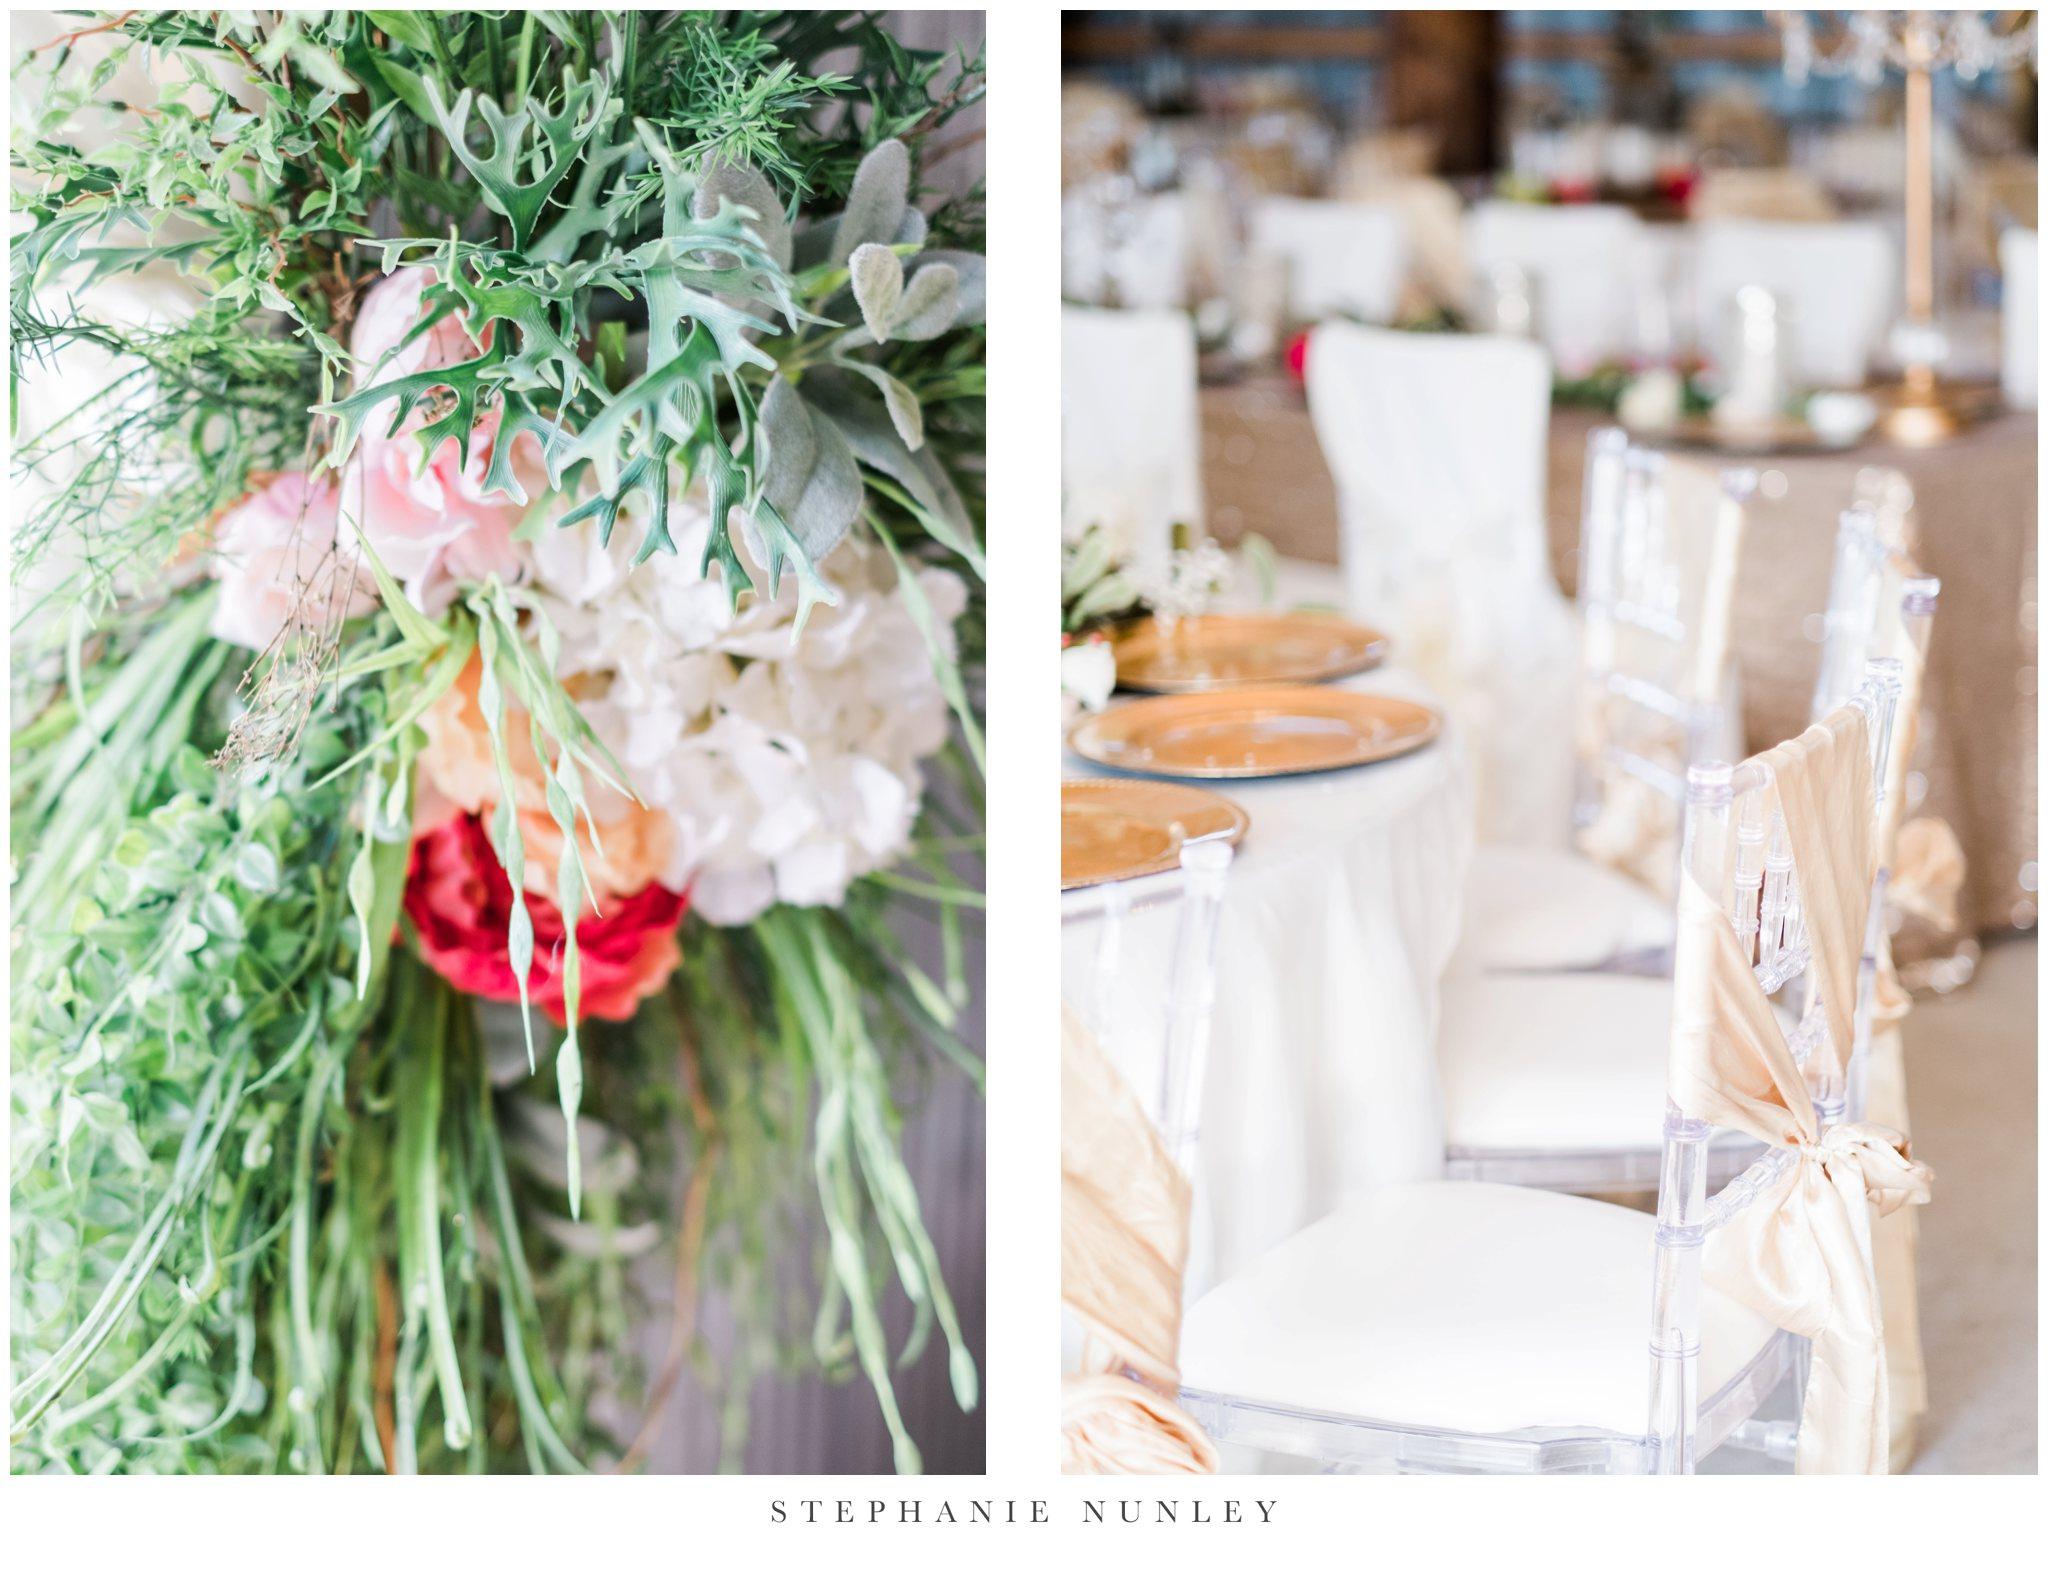 romantic-outdoor-wedding-with-flower-crown-0110.jpg